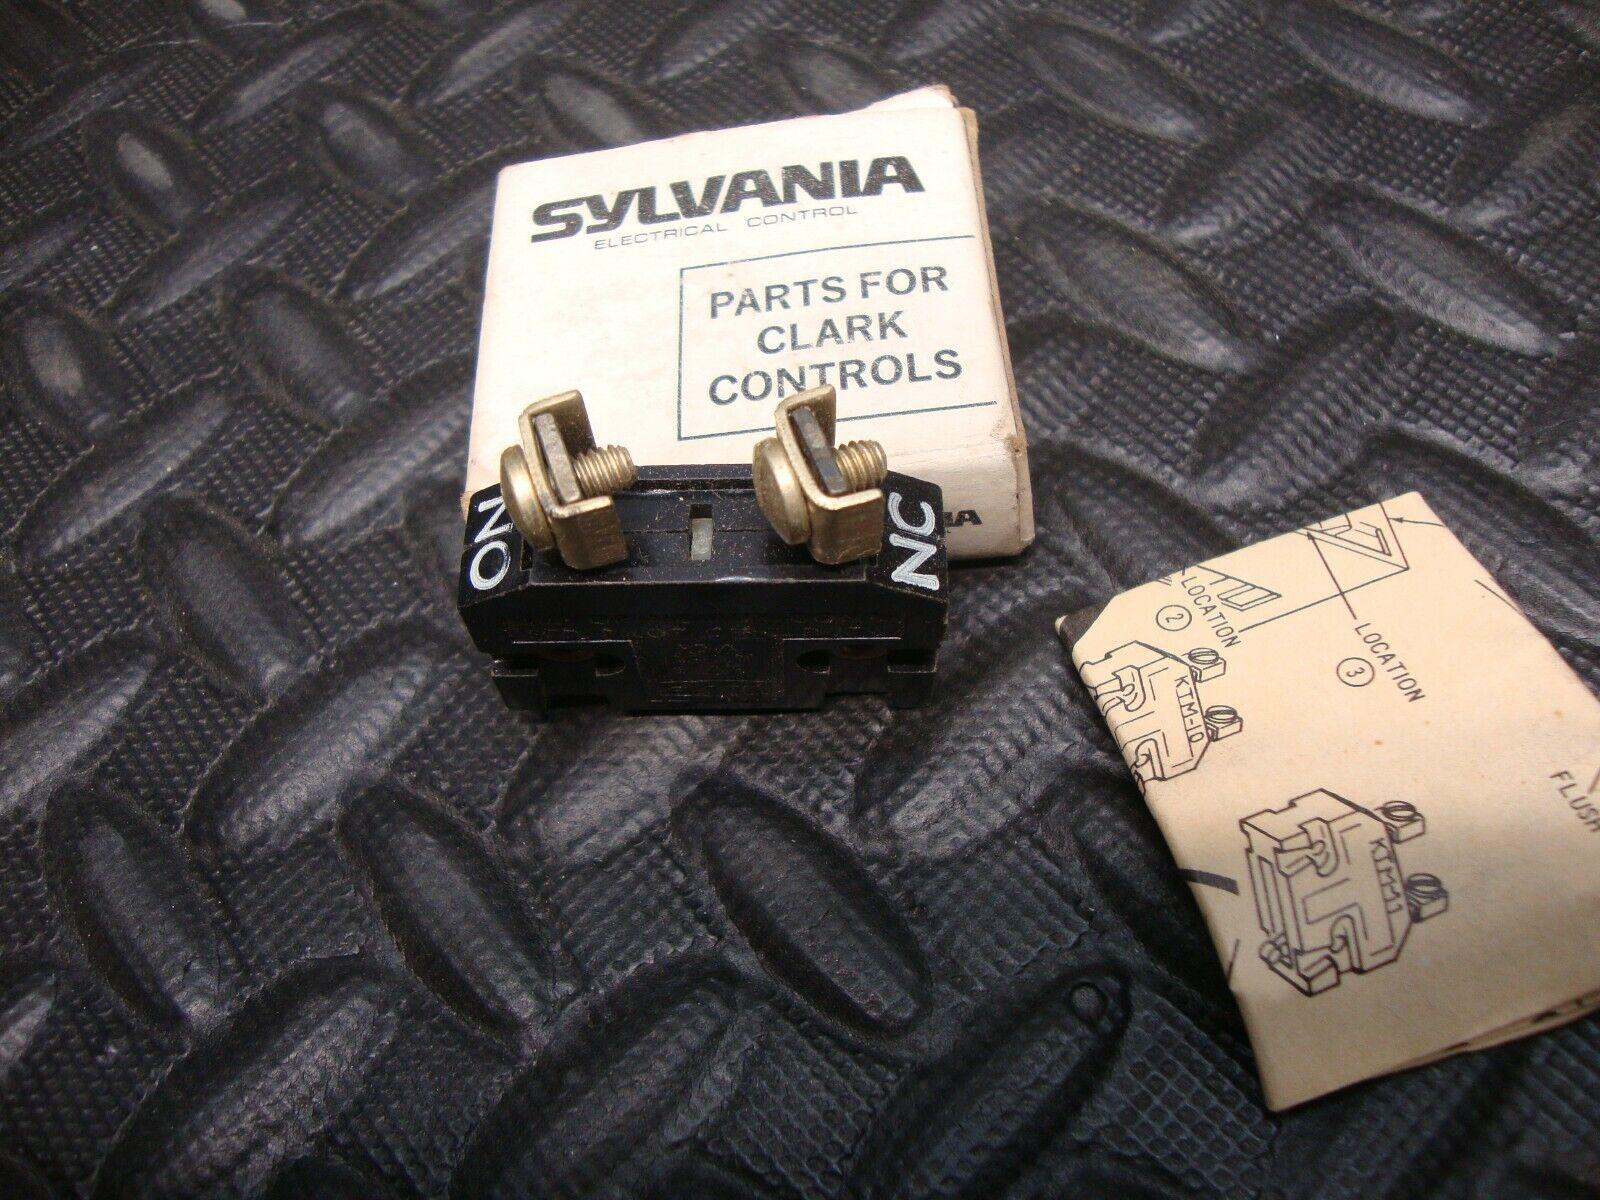 EACH KTM-10 Sylvania Joslyn Clark Auxiliary Contact KTM10 ..